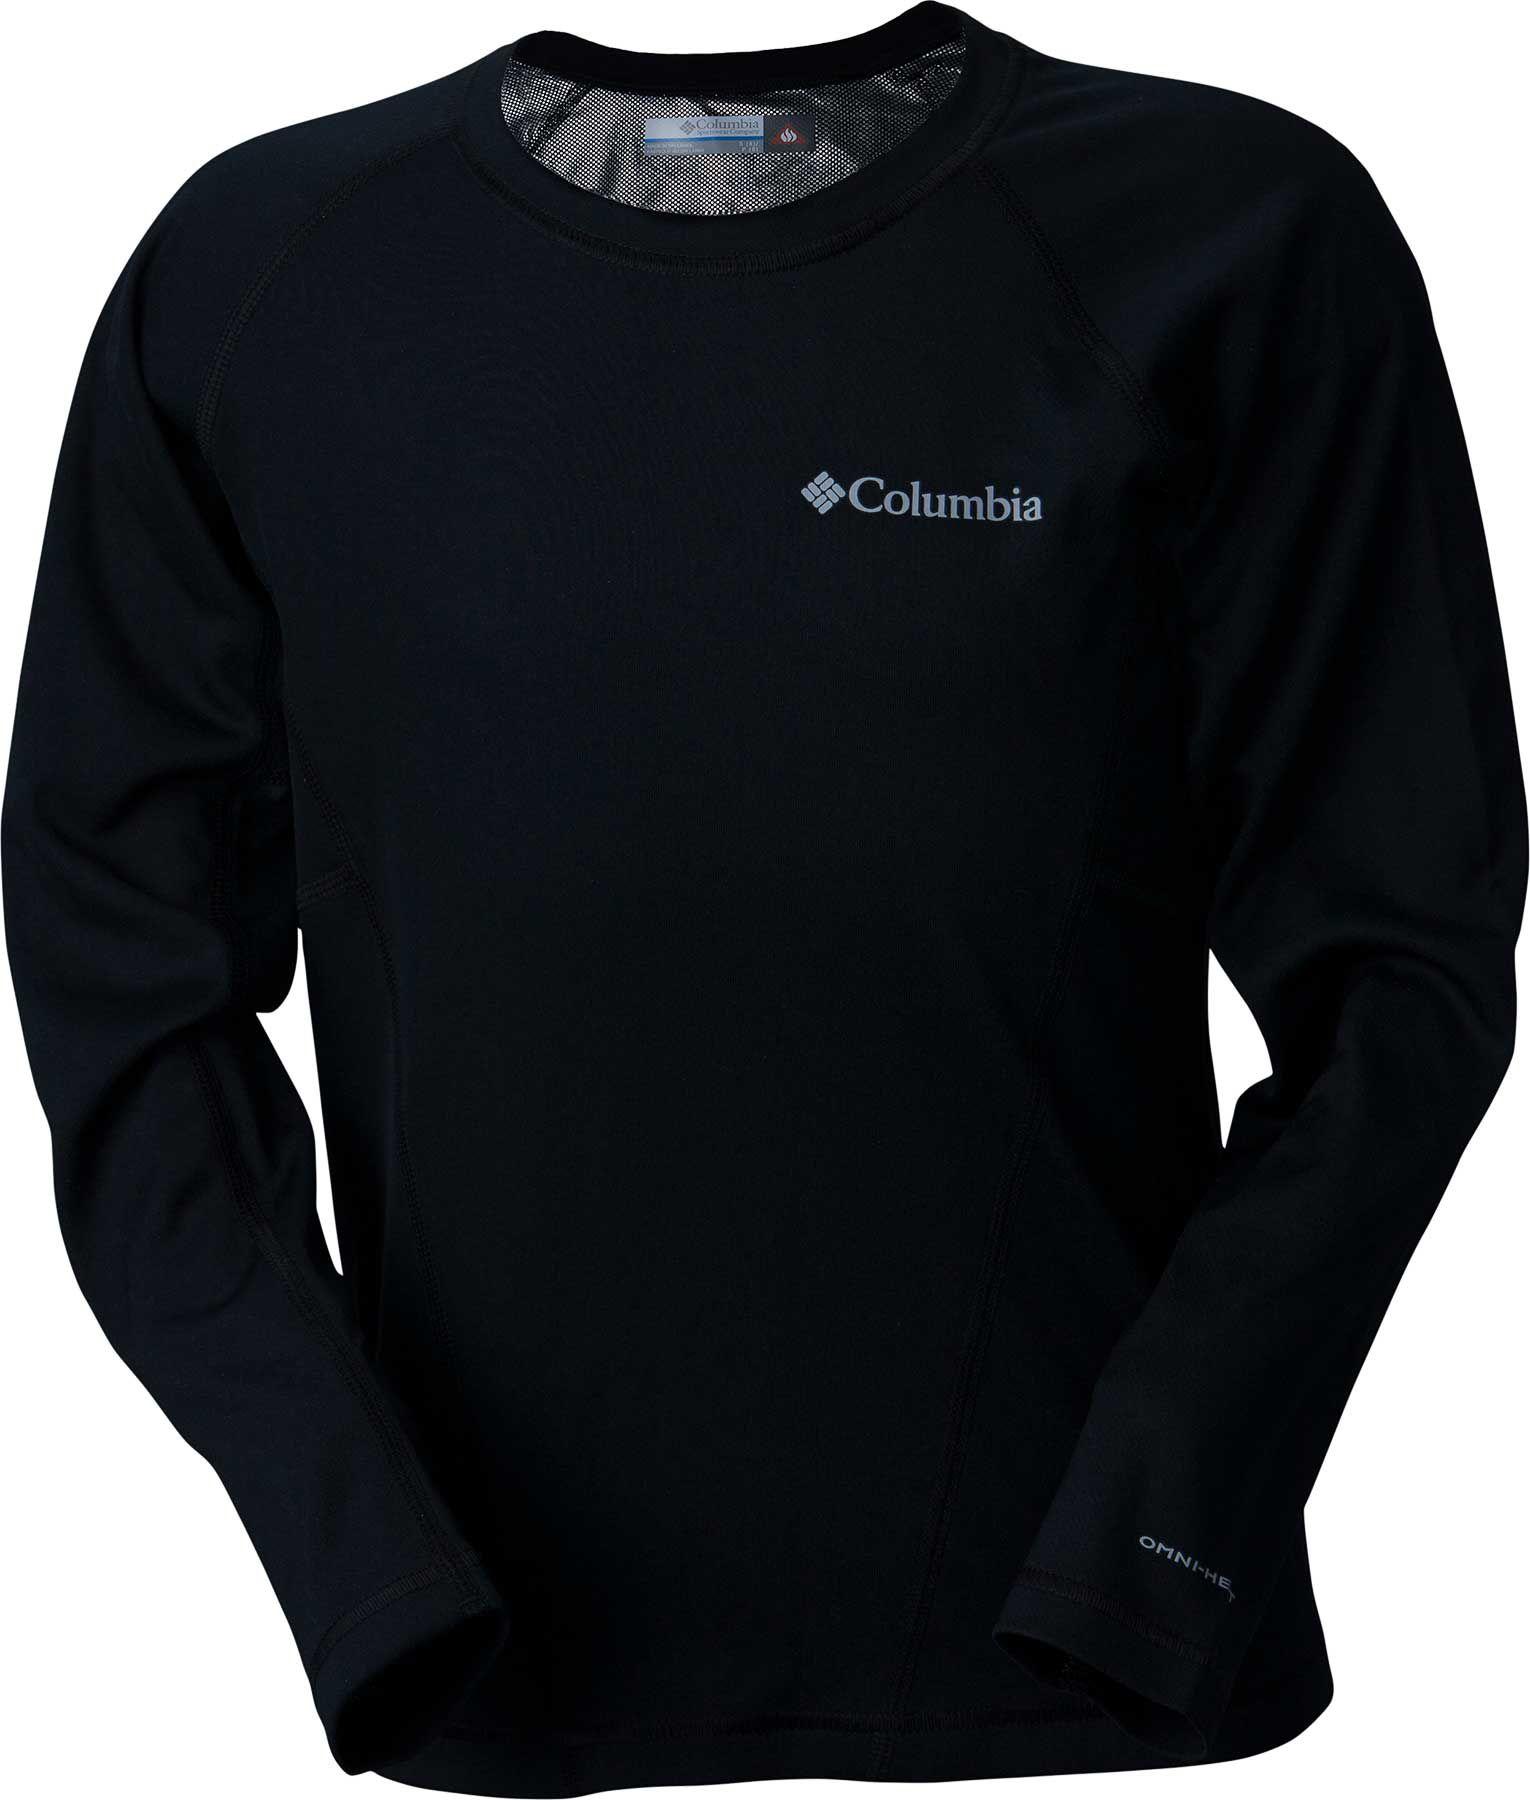 Columbia Boys' Midweight Crew 2 Base Layer Shirt, Size: Large, Black thumbnail